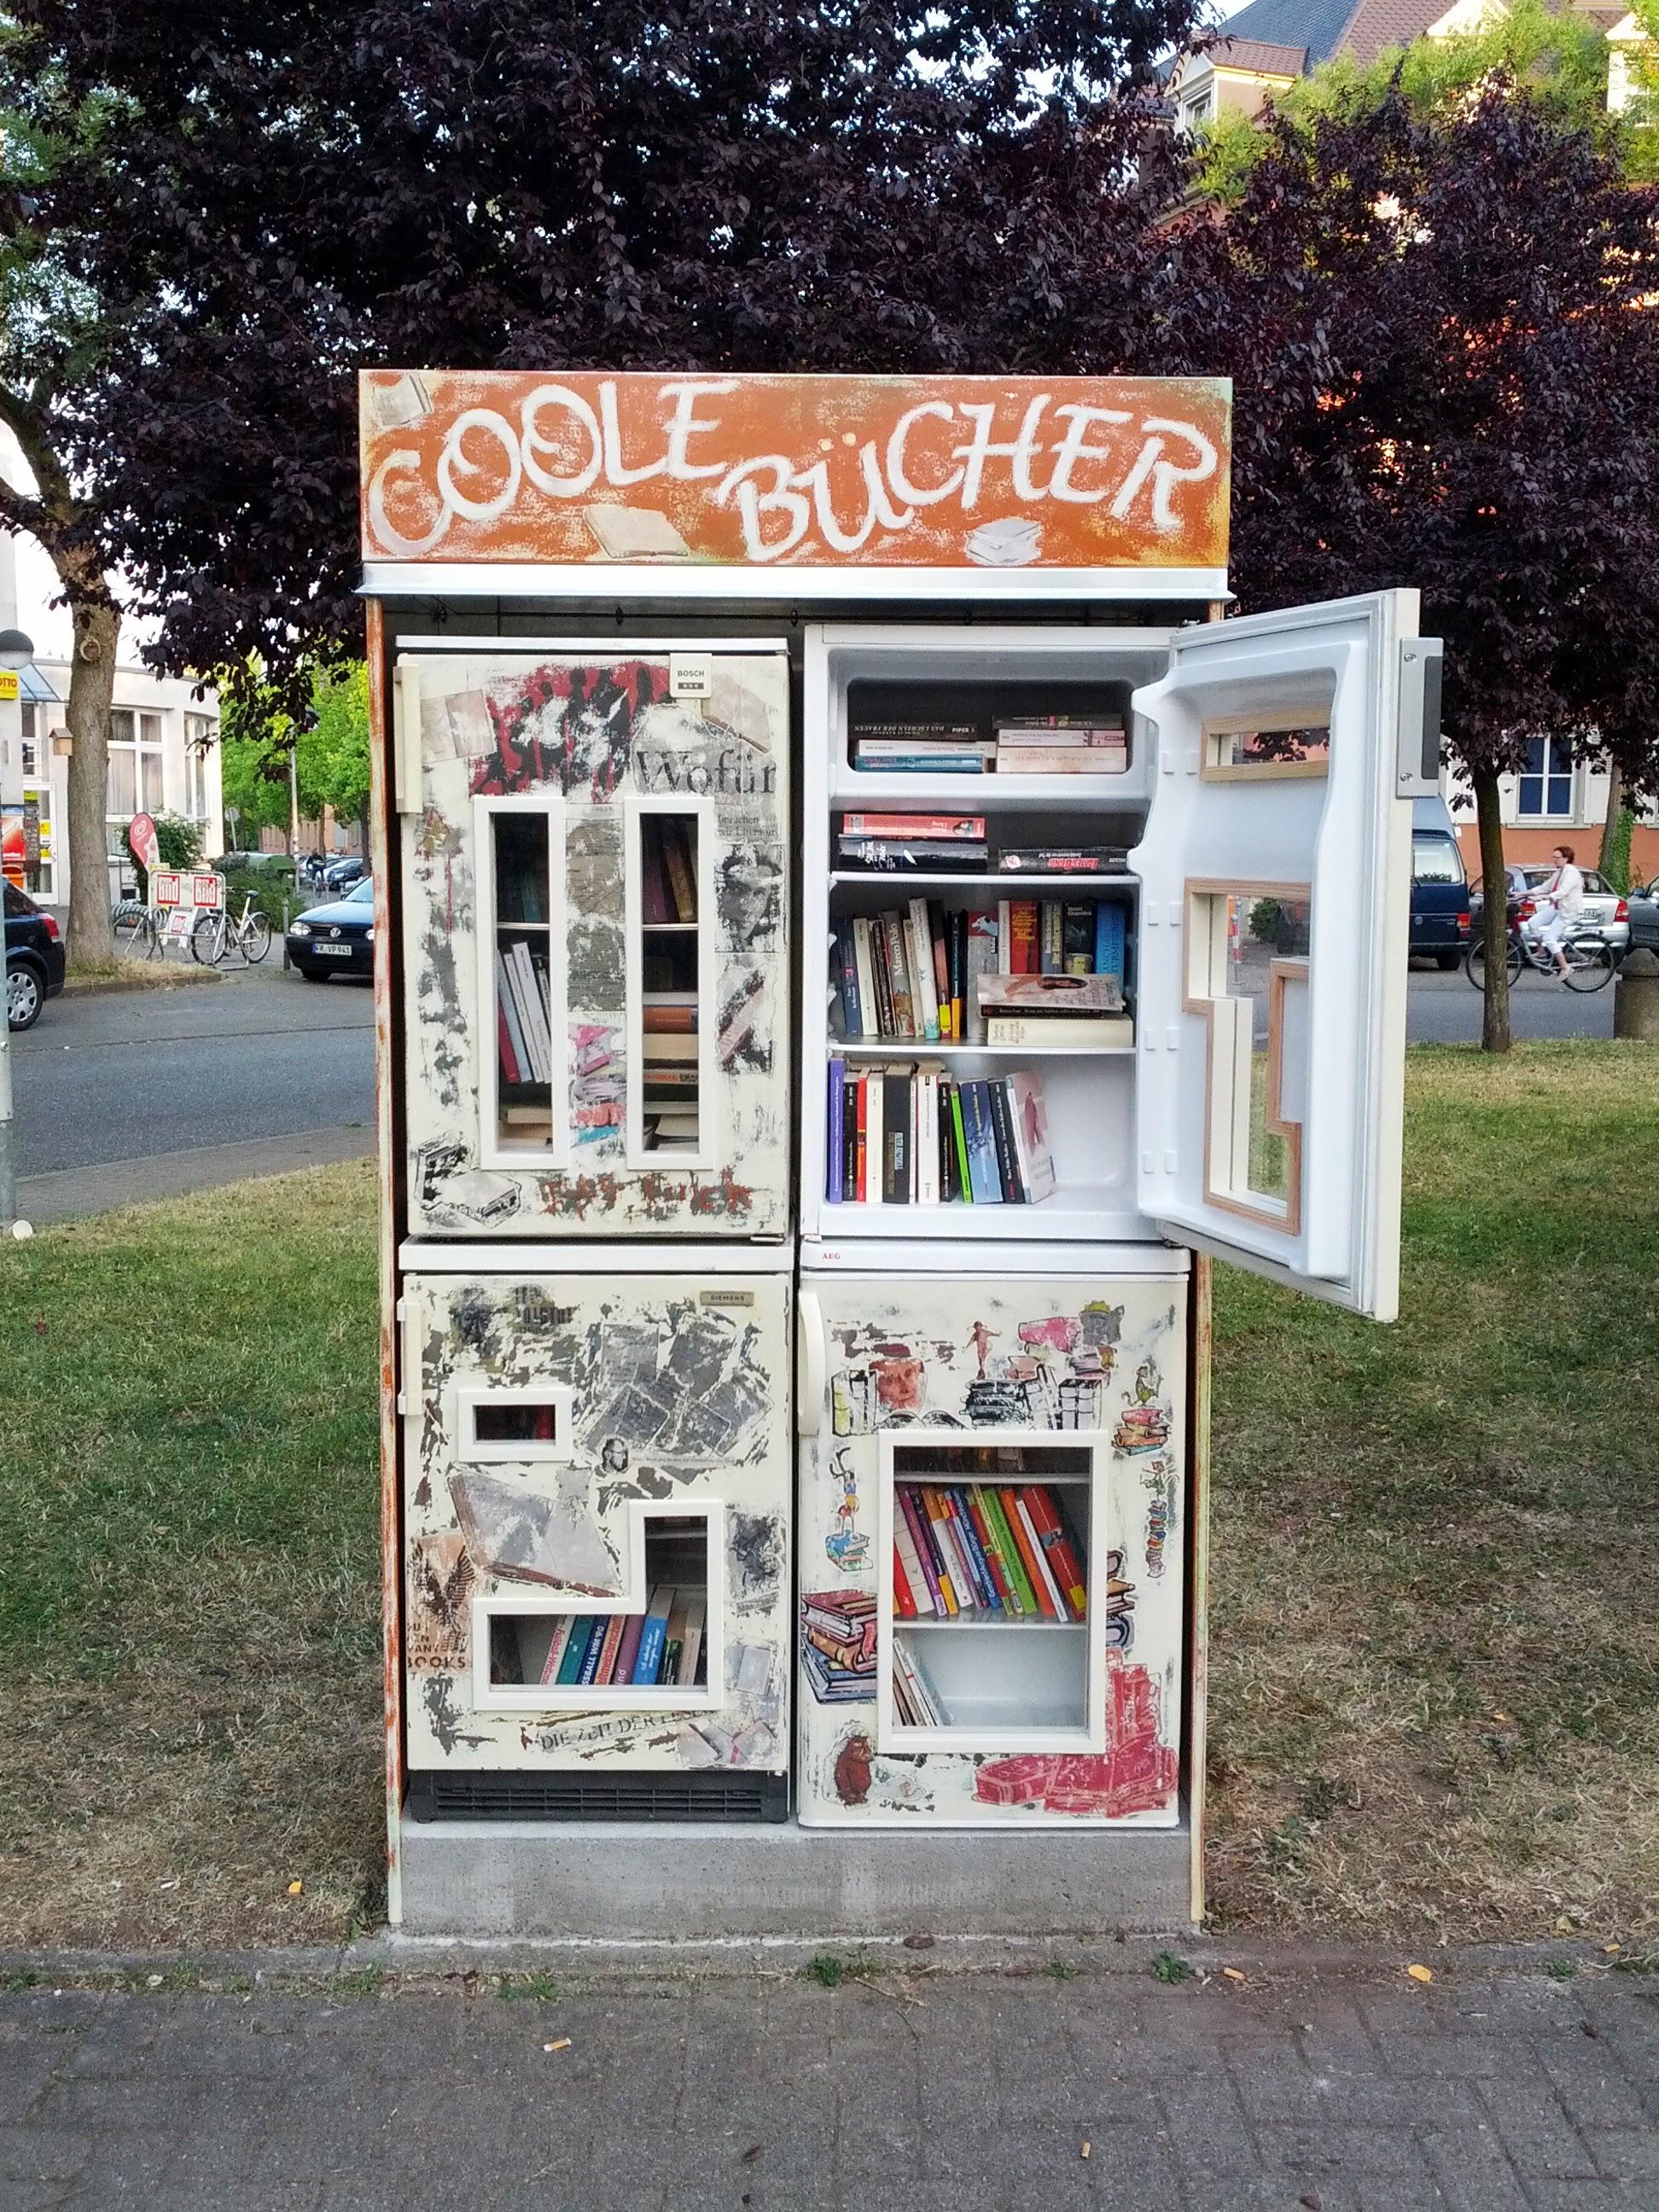 Bücherregal Freiburg-Beurbarung.jpg